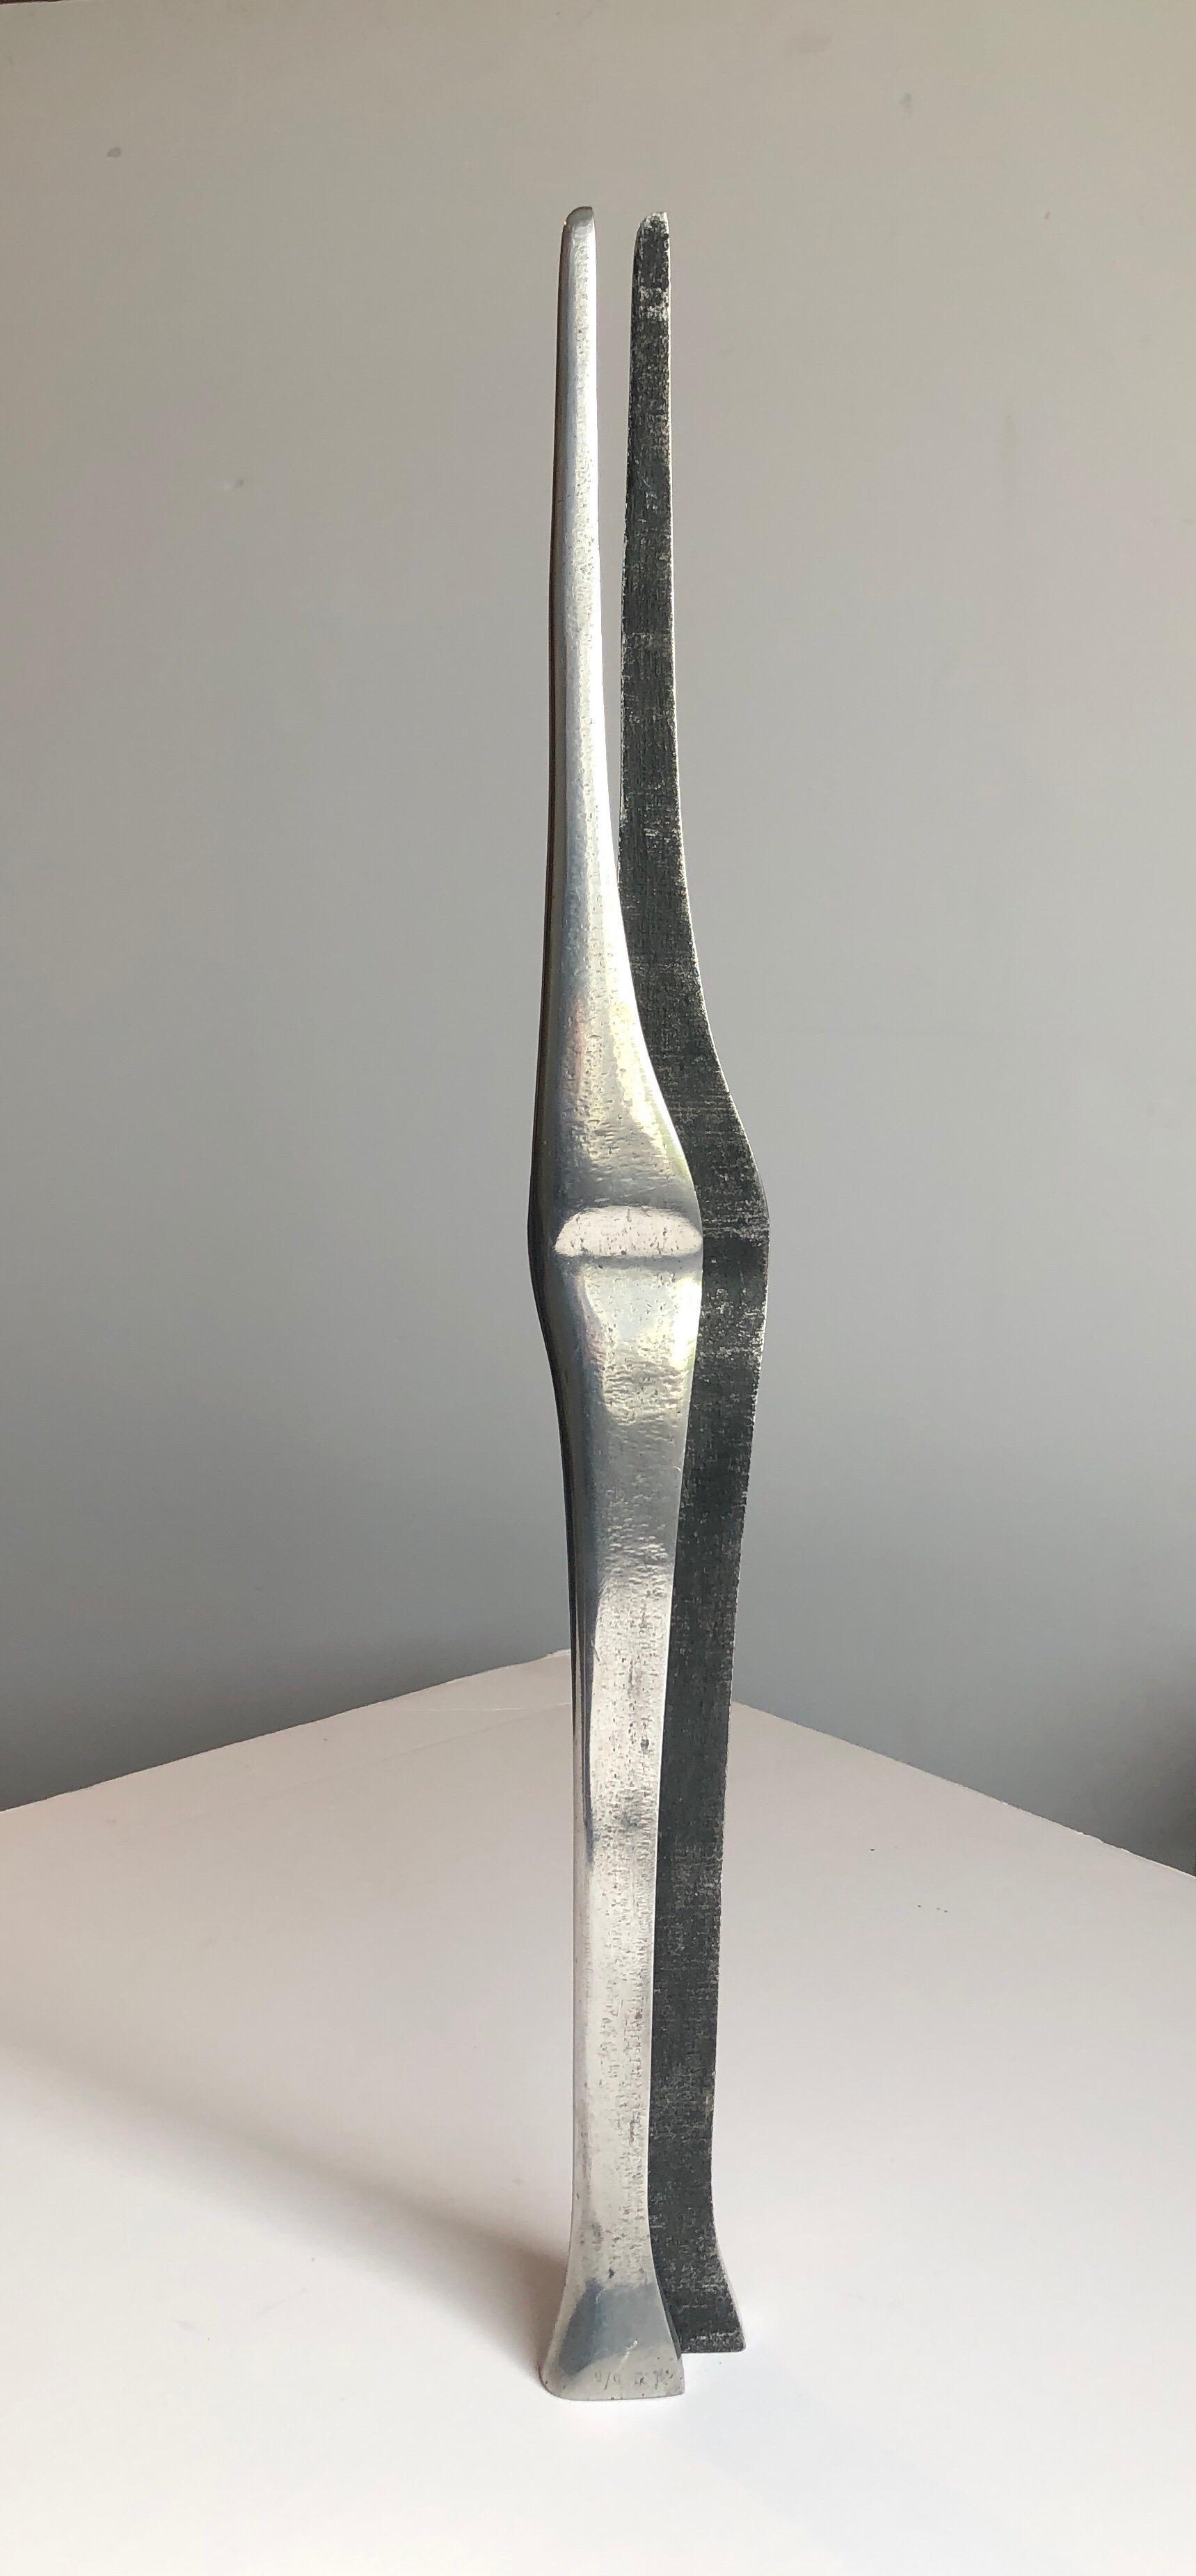 Aharon Bezalel Israeli Modernist Sculpture 2 Parts Minimalist Aluminum or Steel